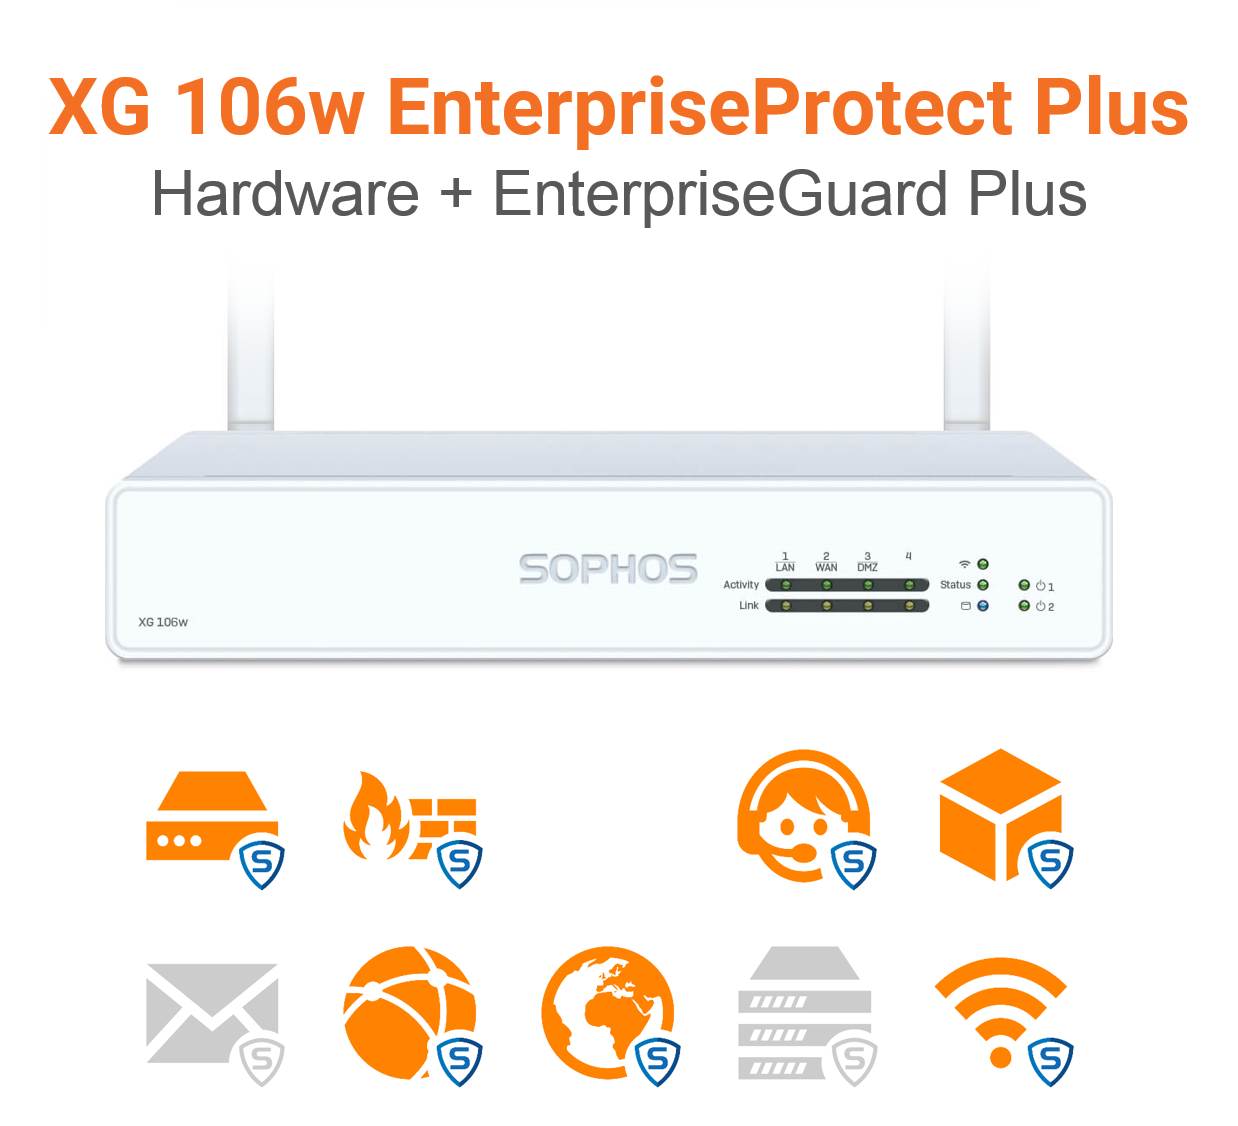 Sophos XG 106w EnterpriseProtect Plus Bundle (Hardware + Lizenz)